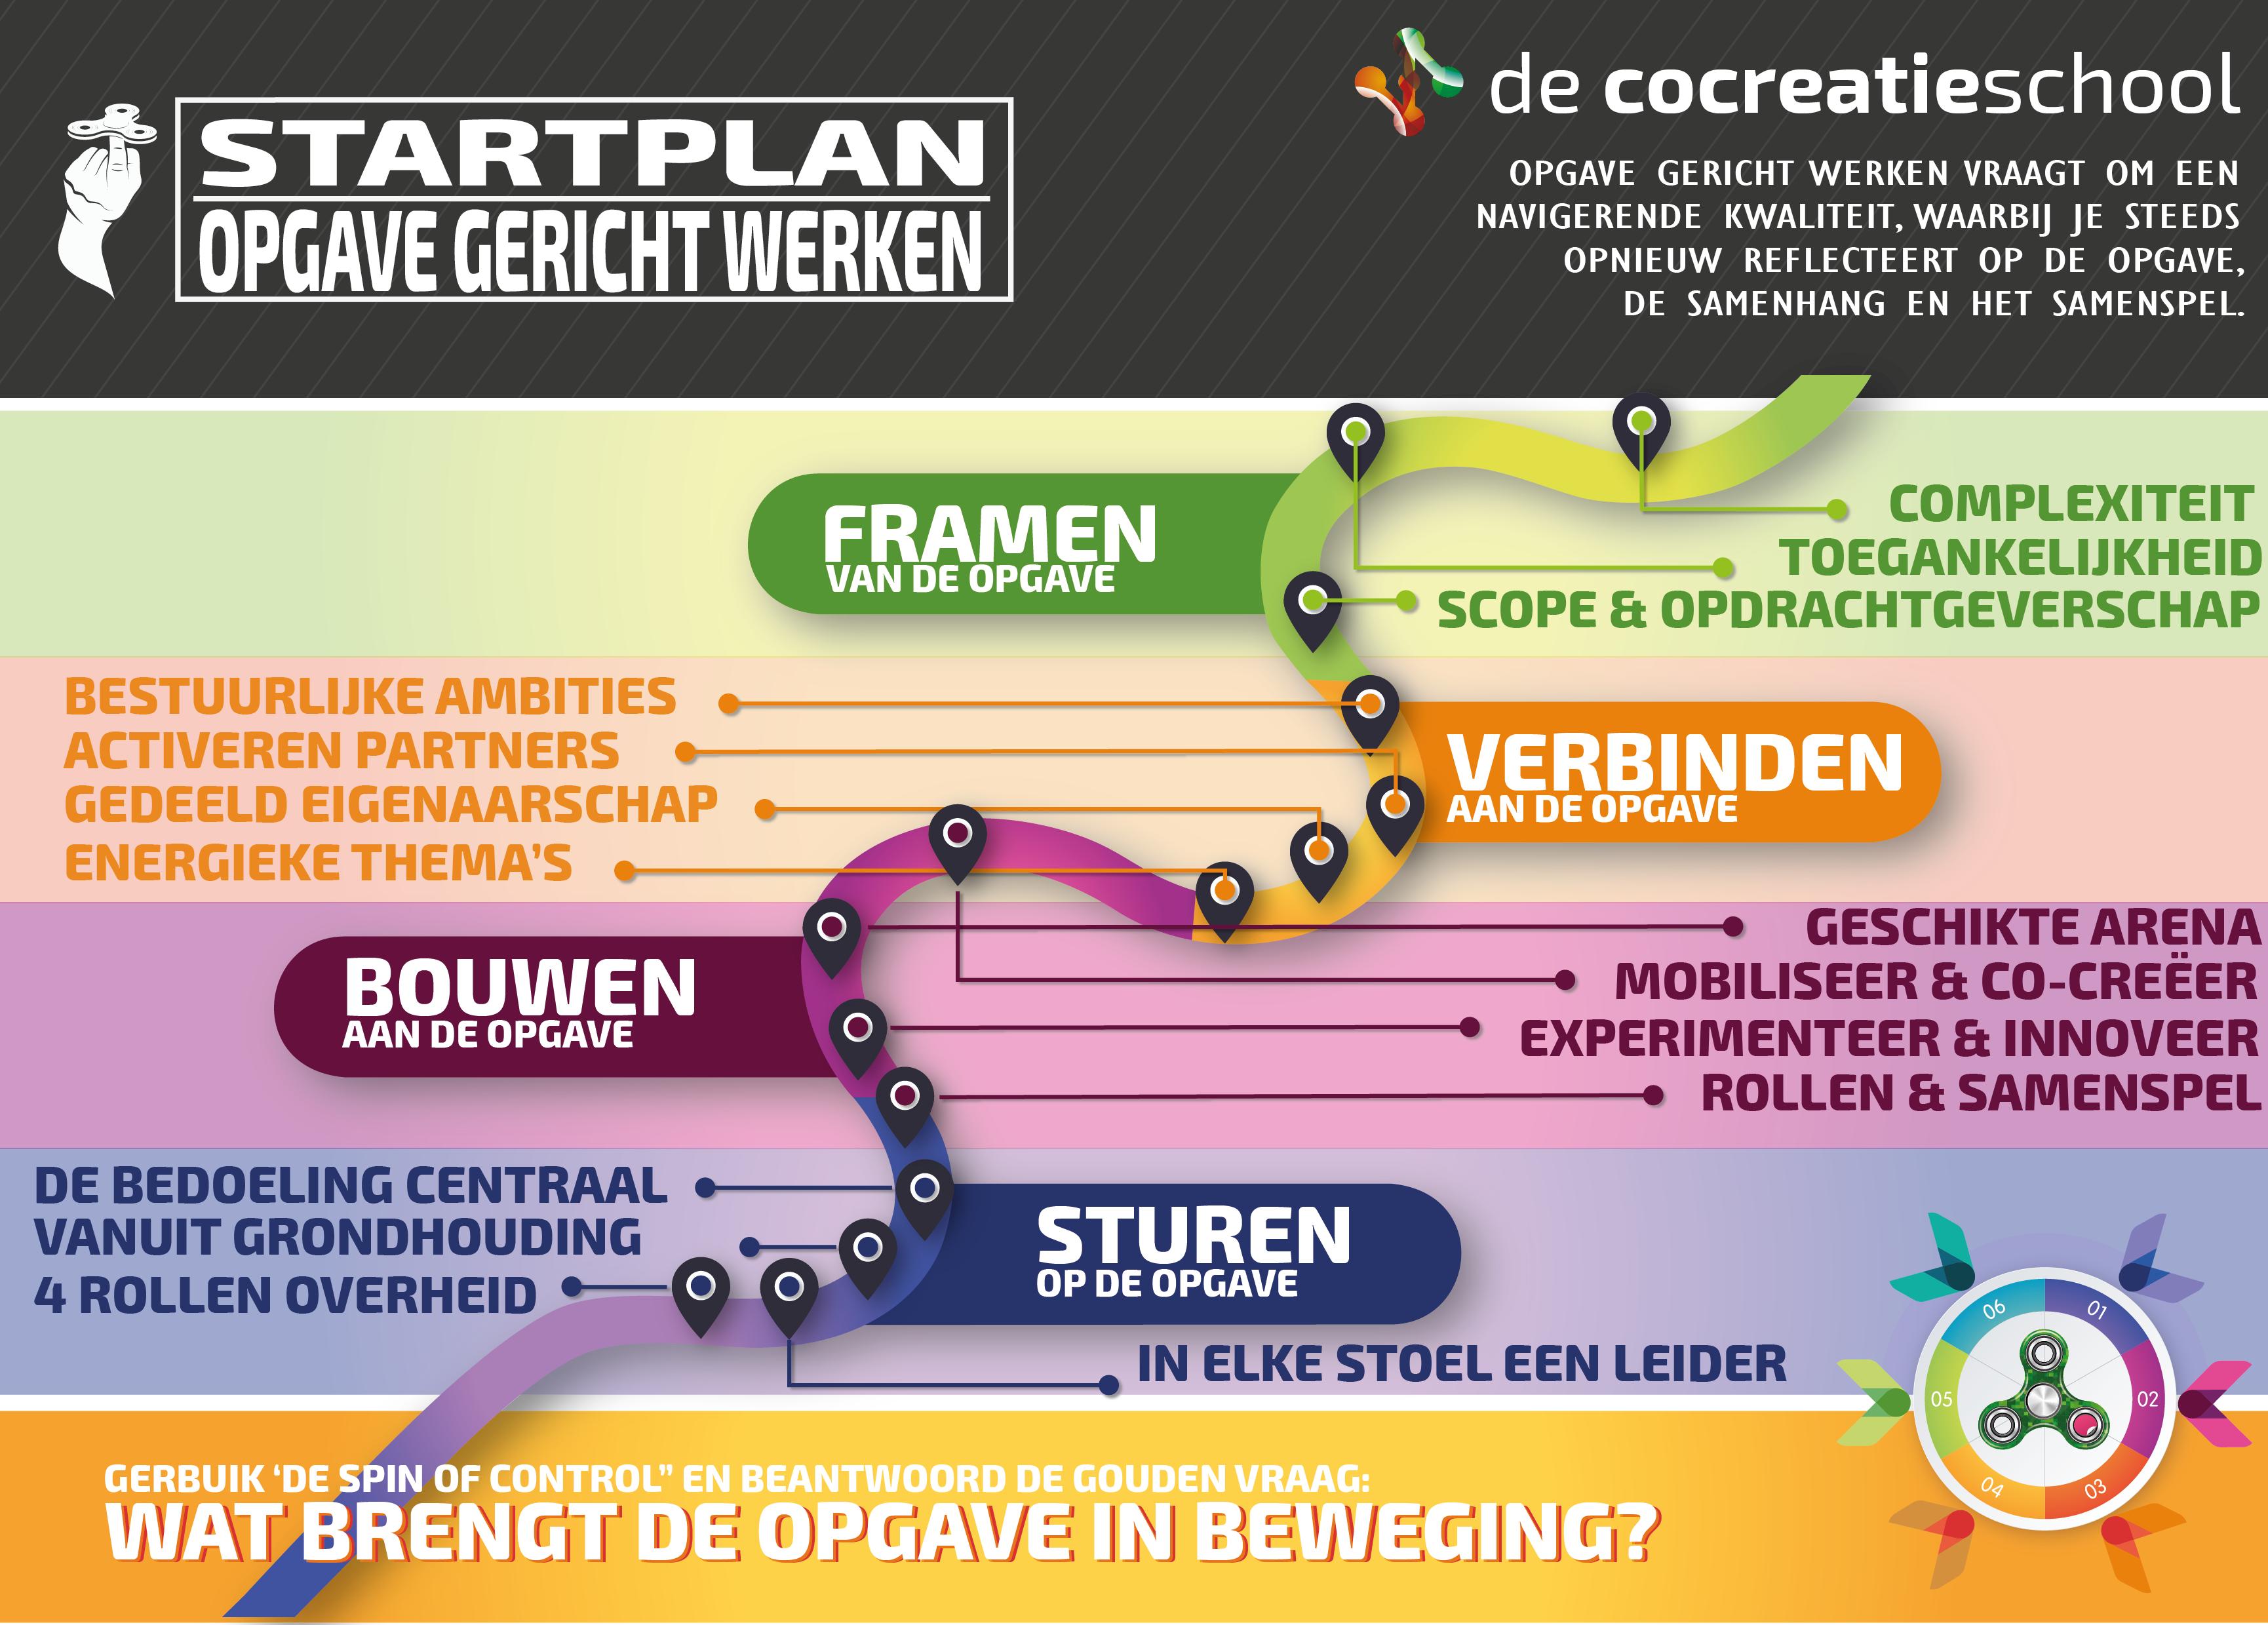 Startplan OGW